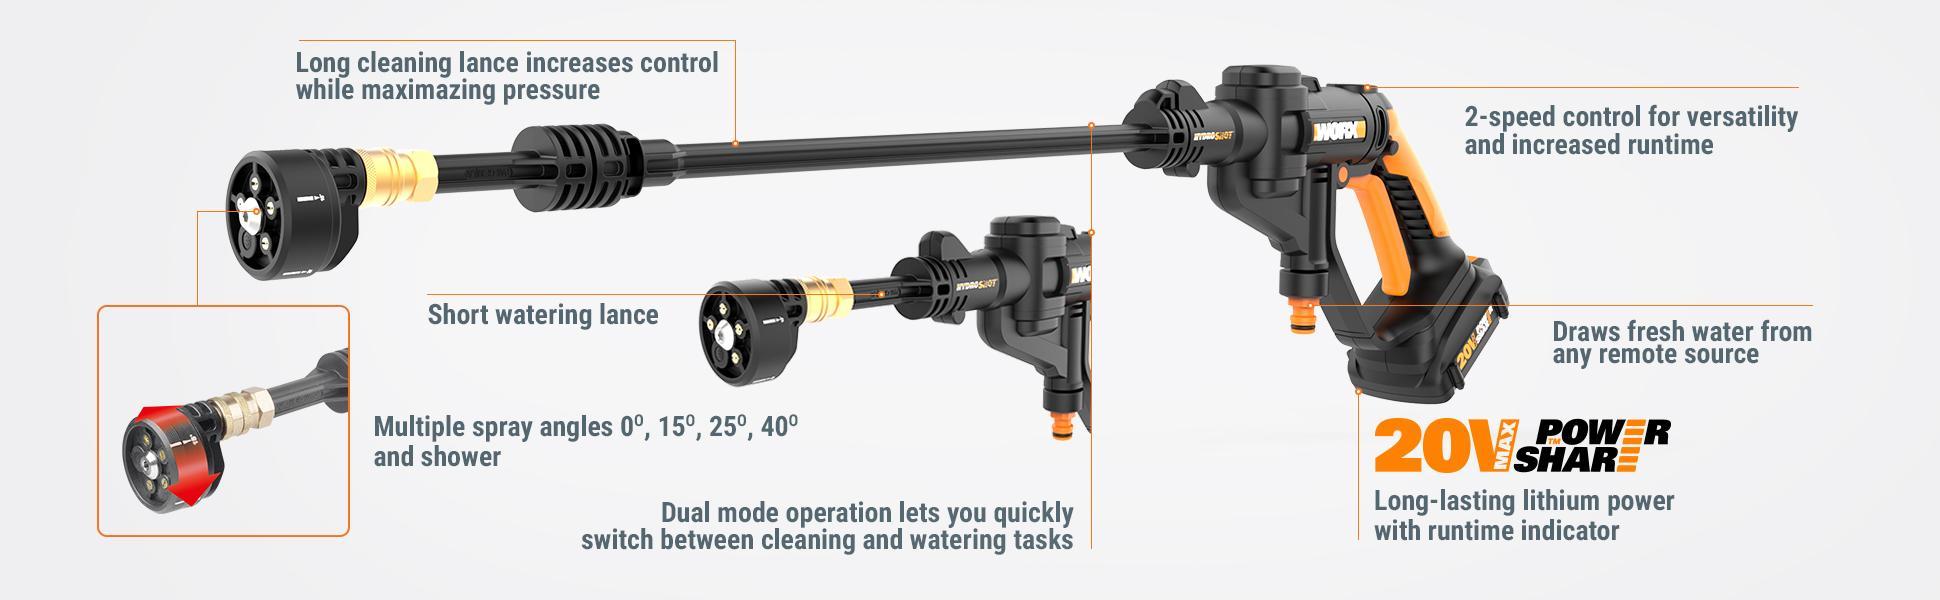 Worx Cordless Hydroshot Portable Power Cleaner 20v Li Ion